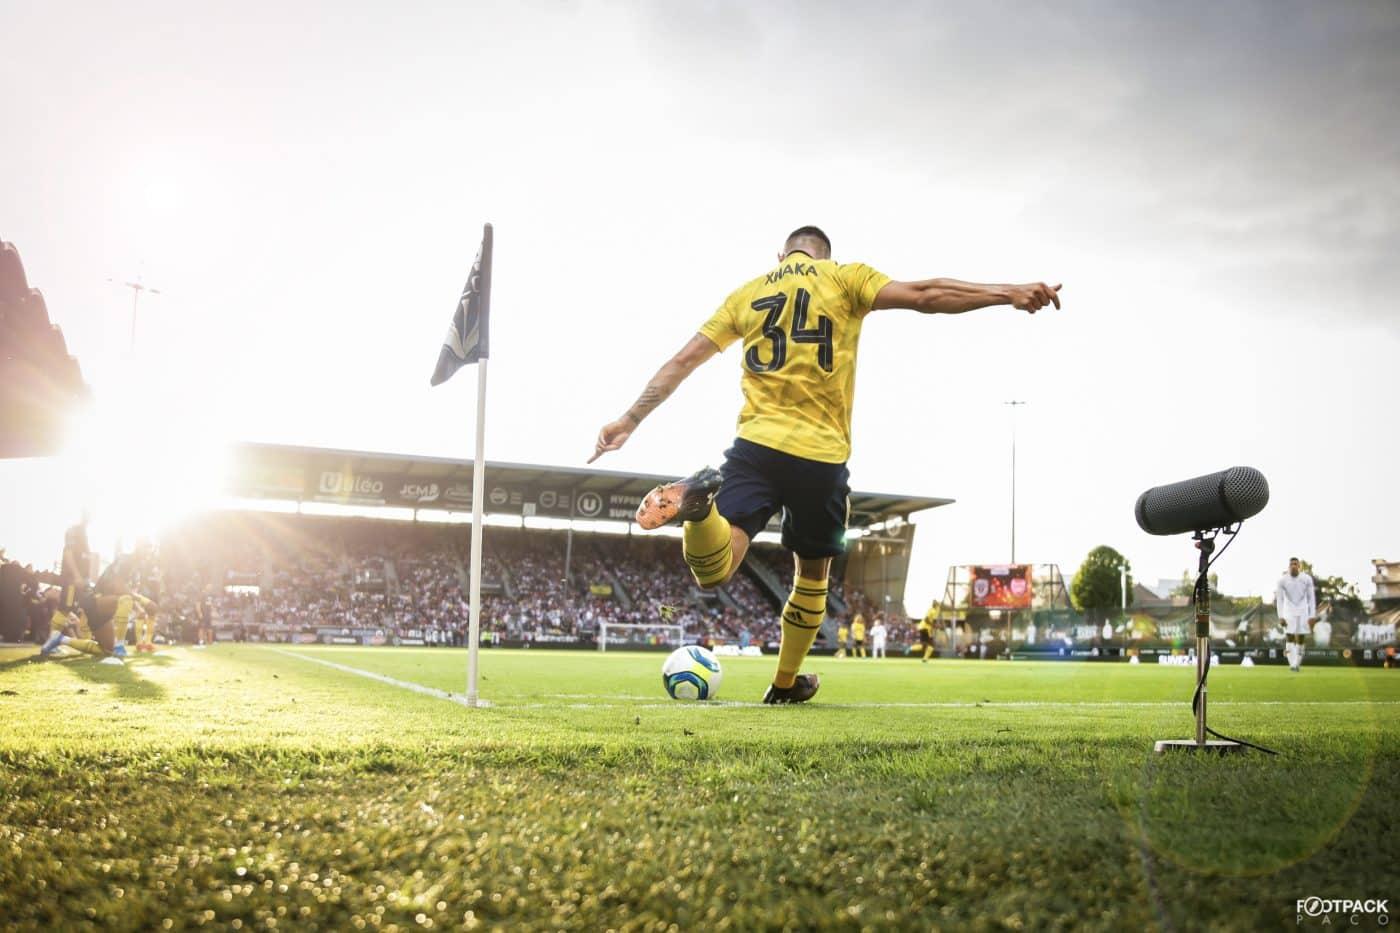 au-stade-sco-angers-arsenal-100-ans-sco-2019-footpack-21